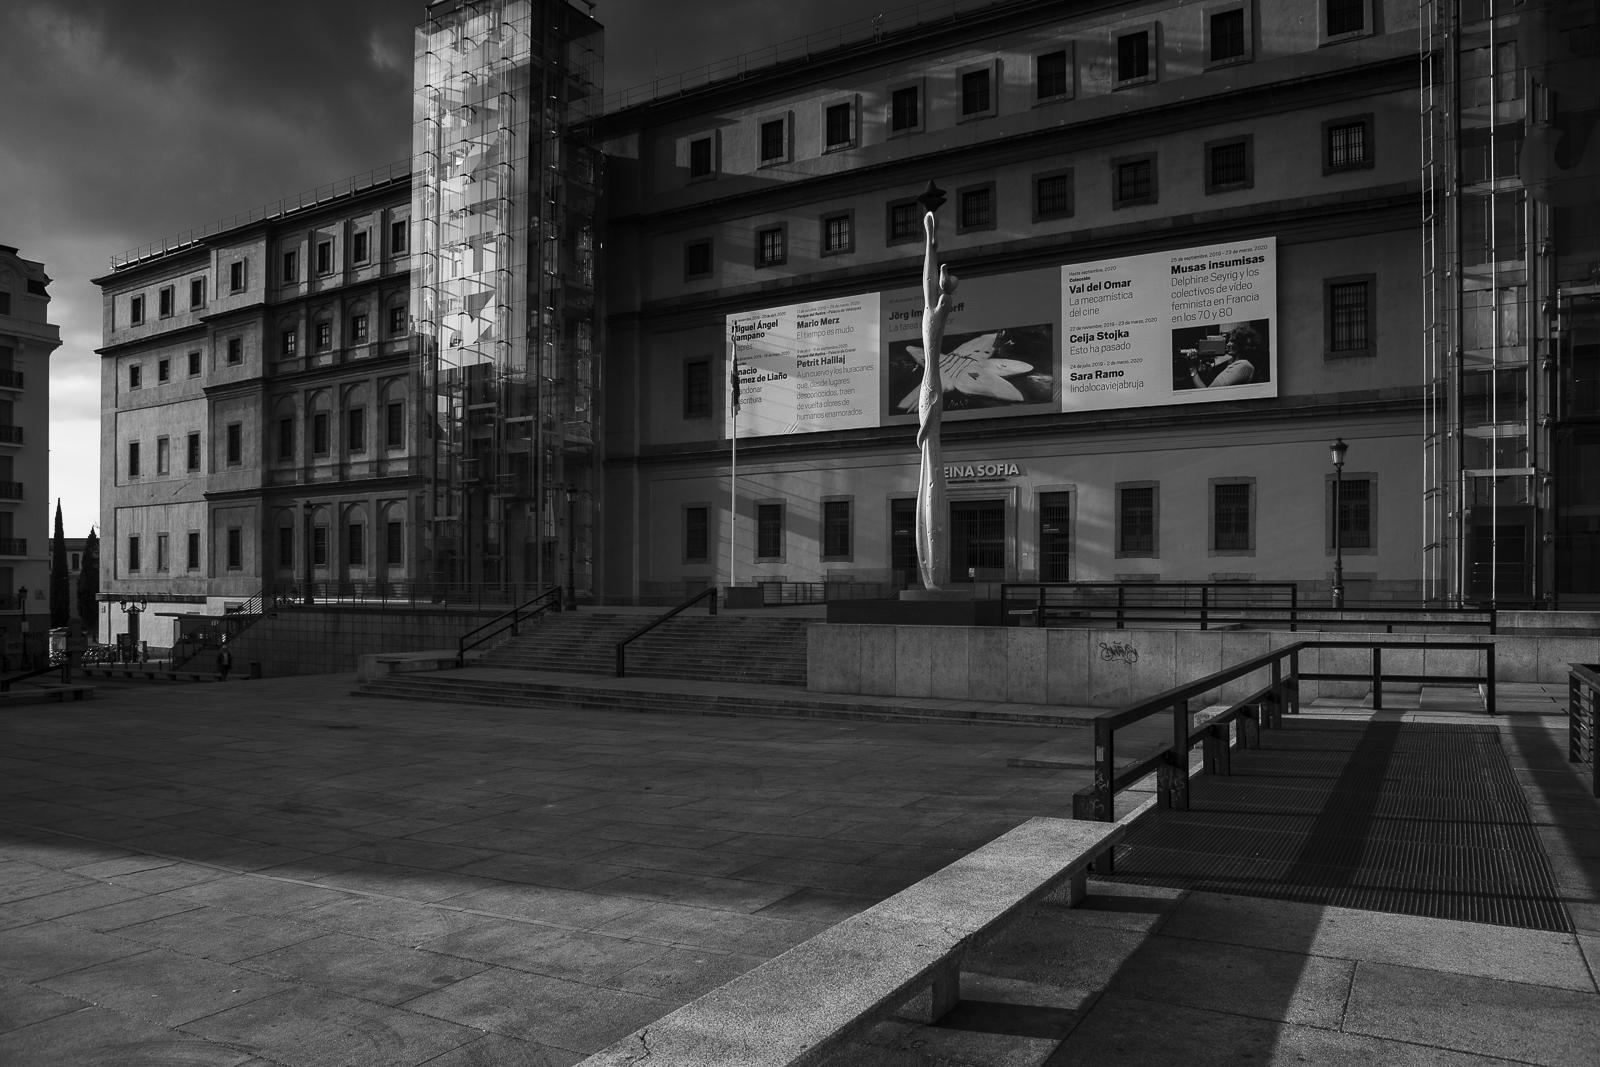 Reina Sofia Museum closed during the lockdown amid coronavirus pandemic in Madrid.